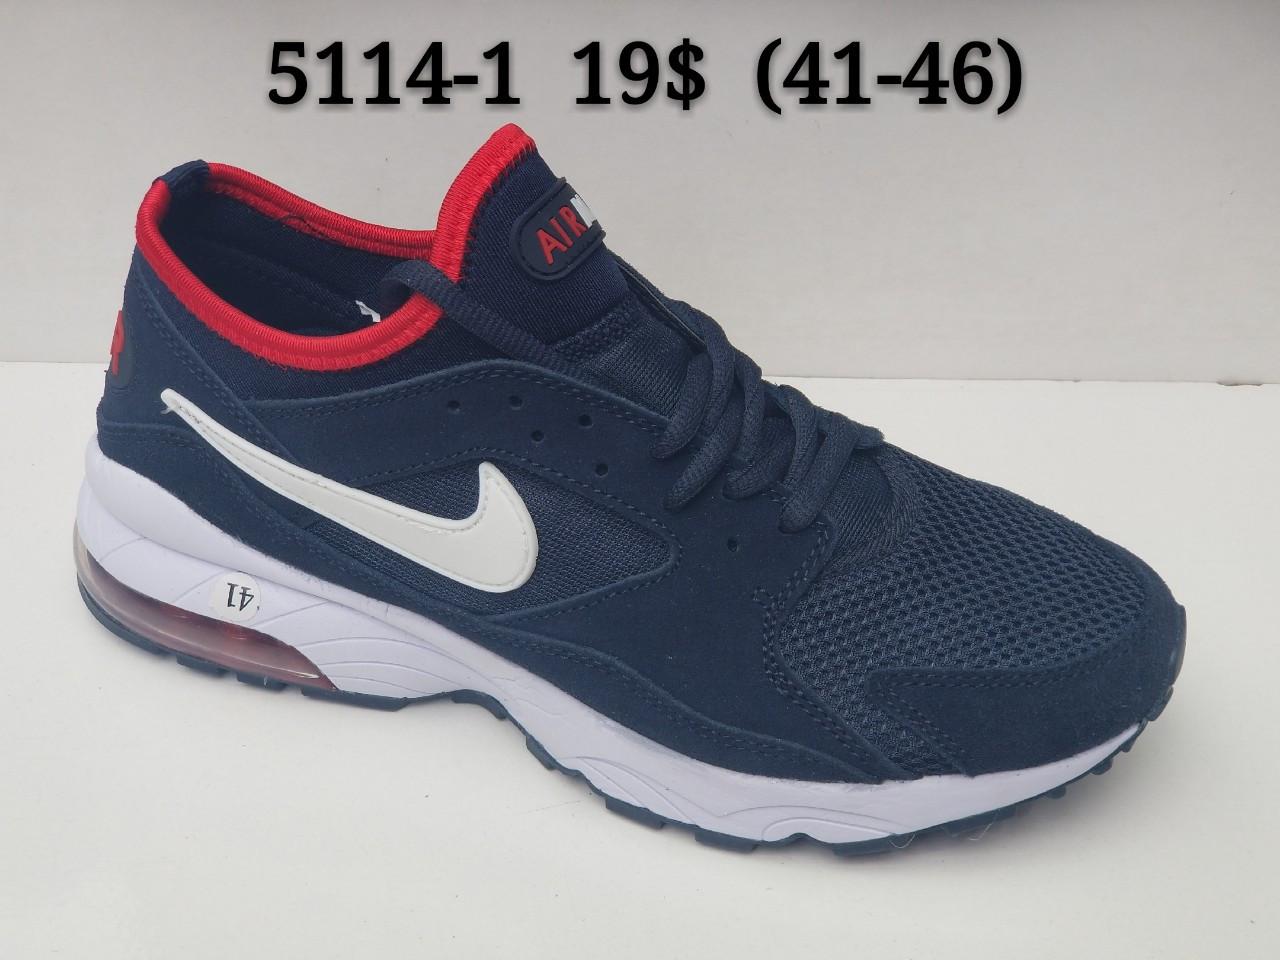 Мужские кроссовки Nike Air Max оптом (41-46)